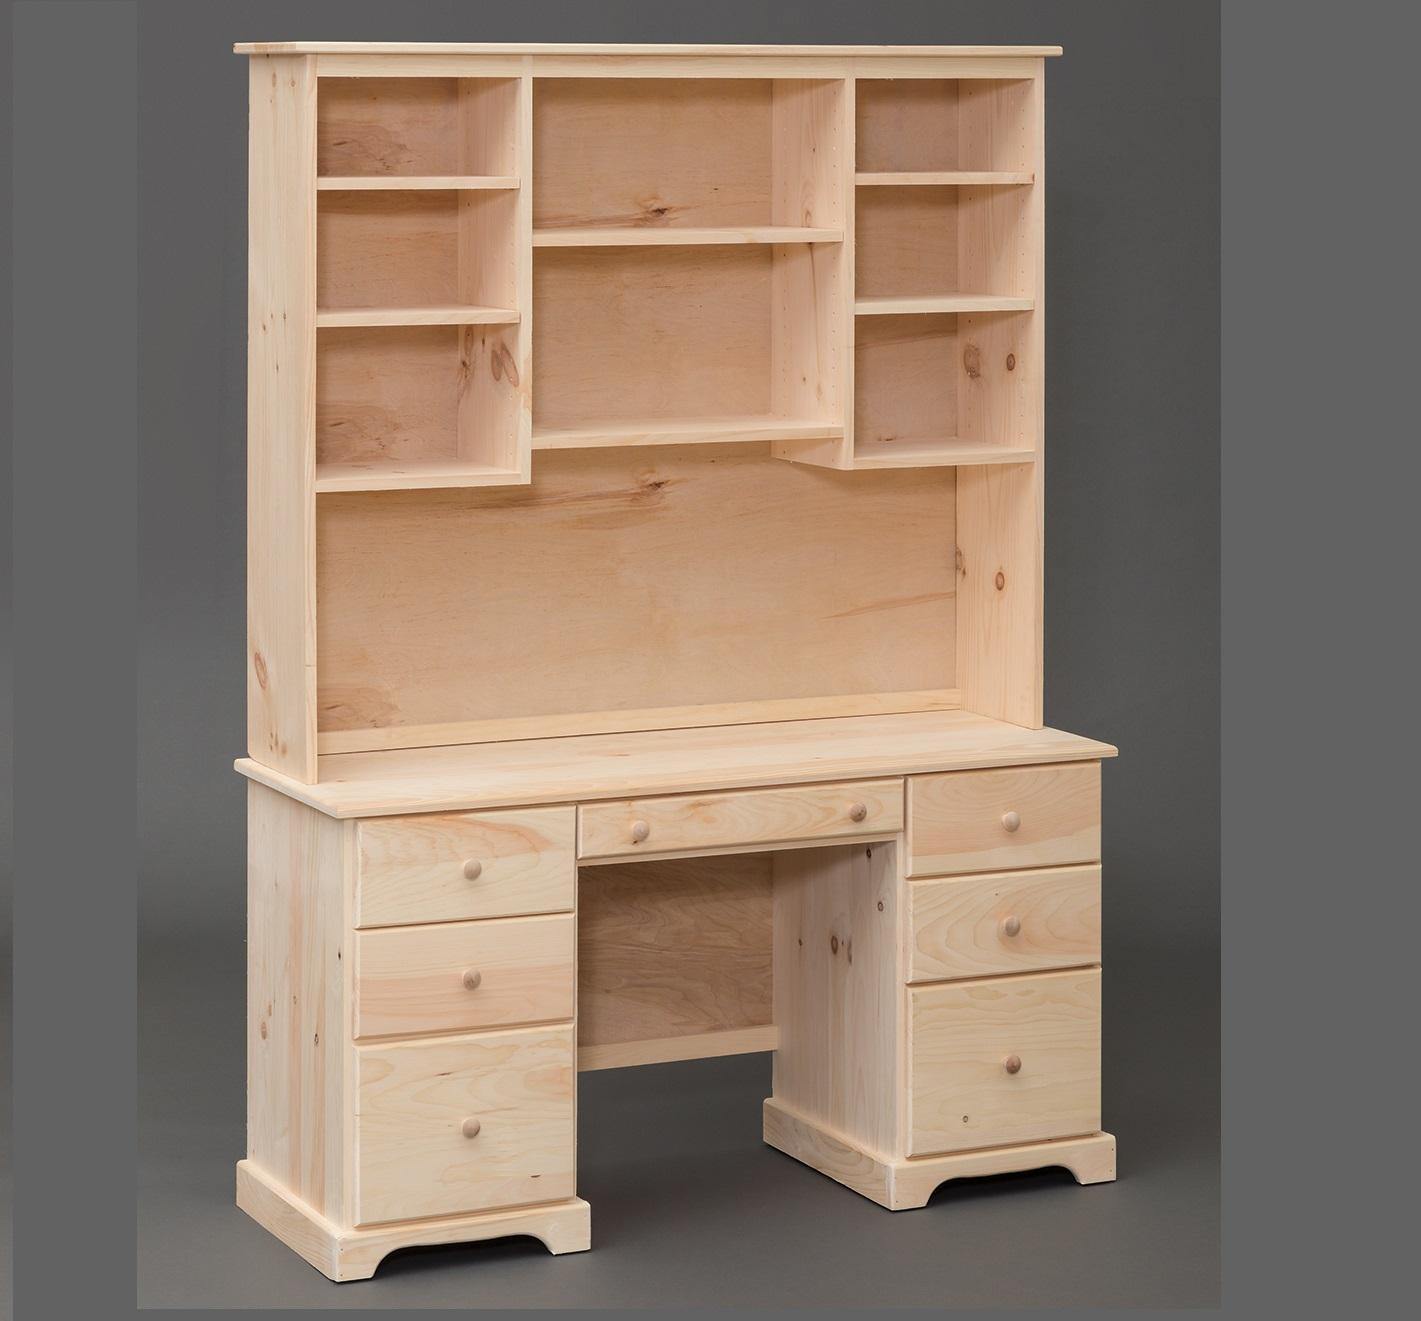 Amish Built Shaker Pine Desk